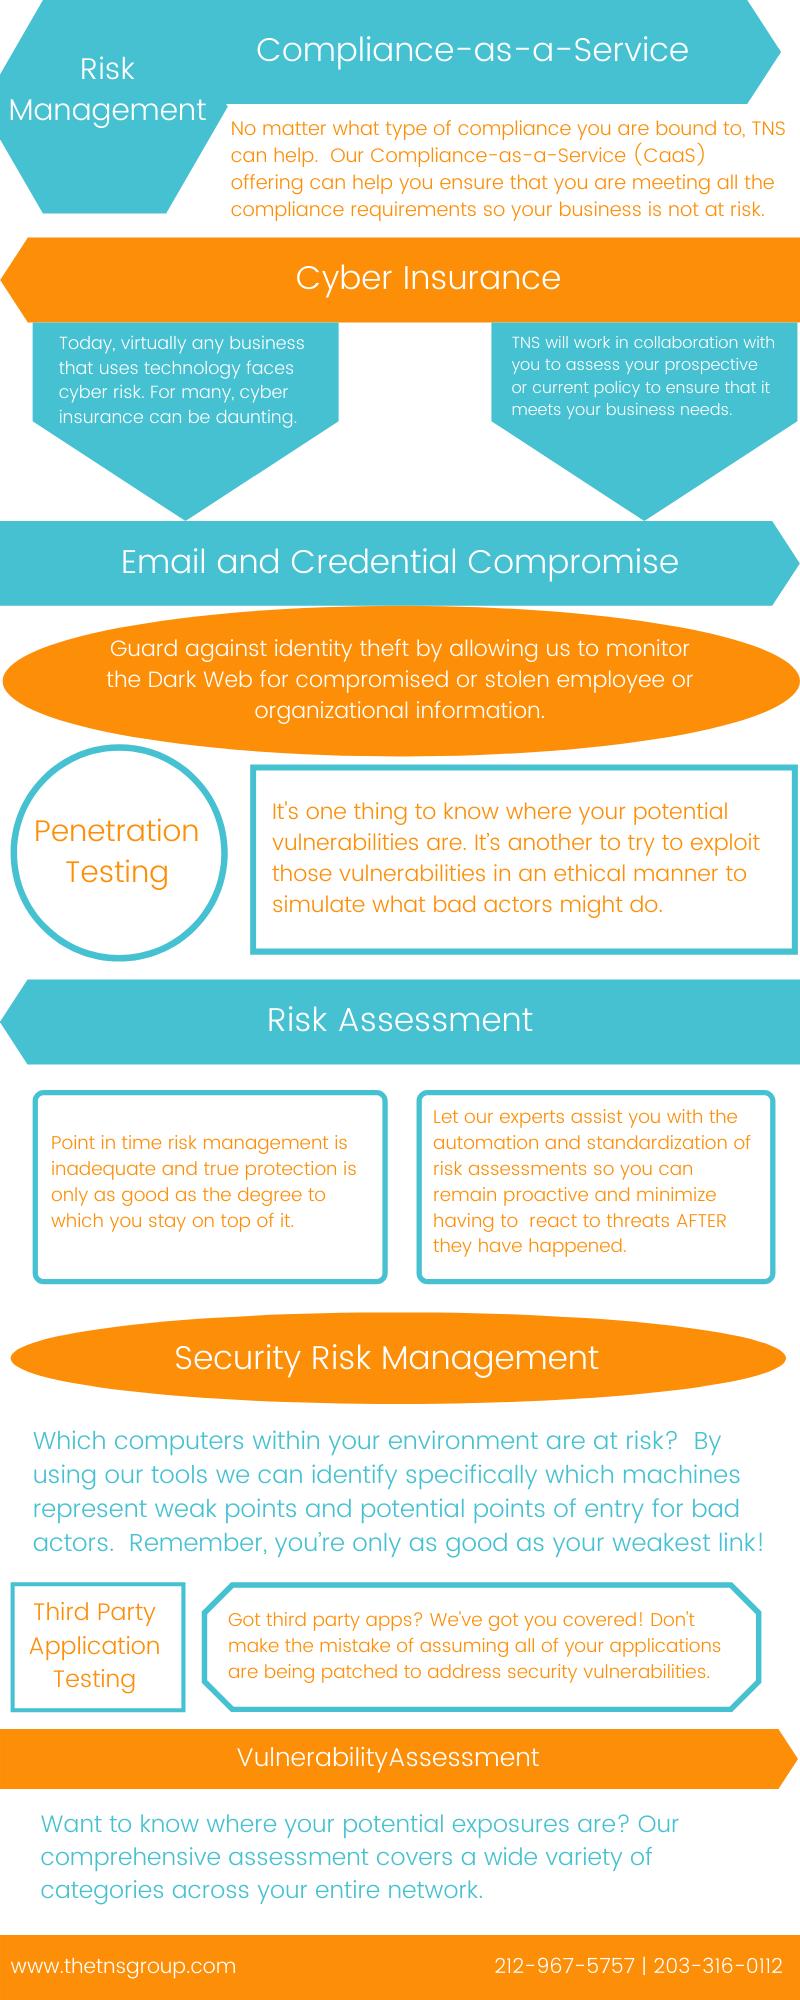 msp-news-infographic-risk-mangement